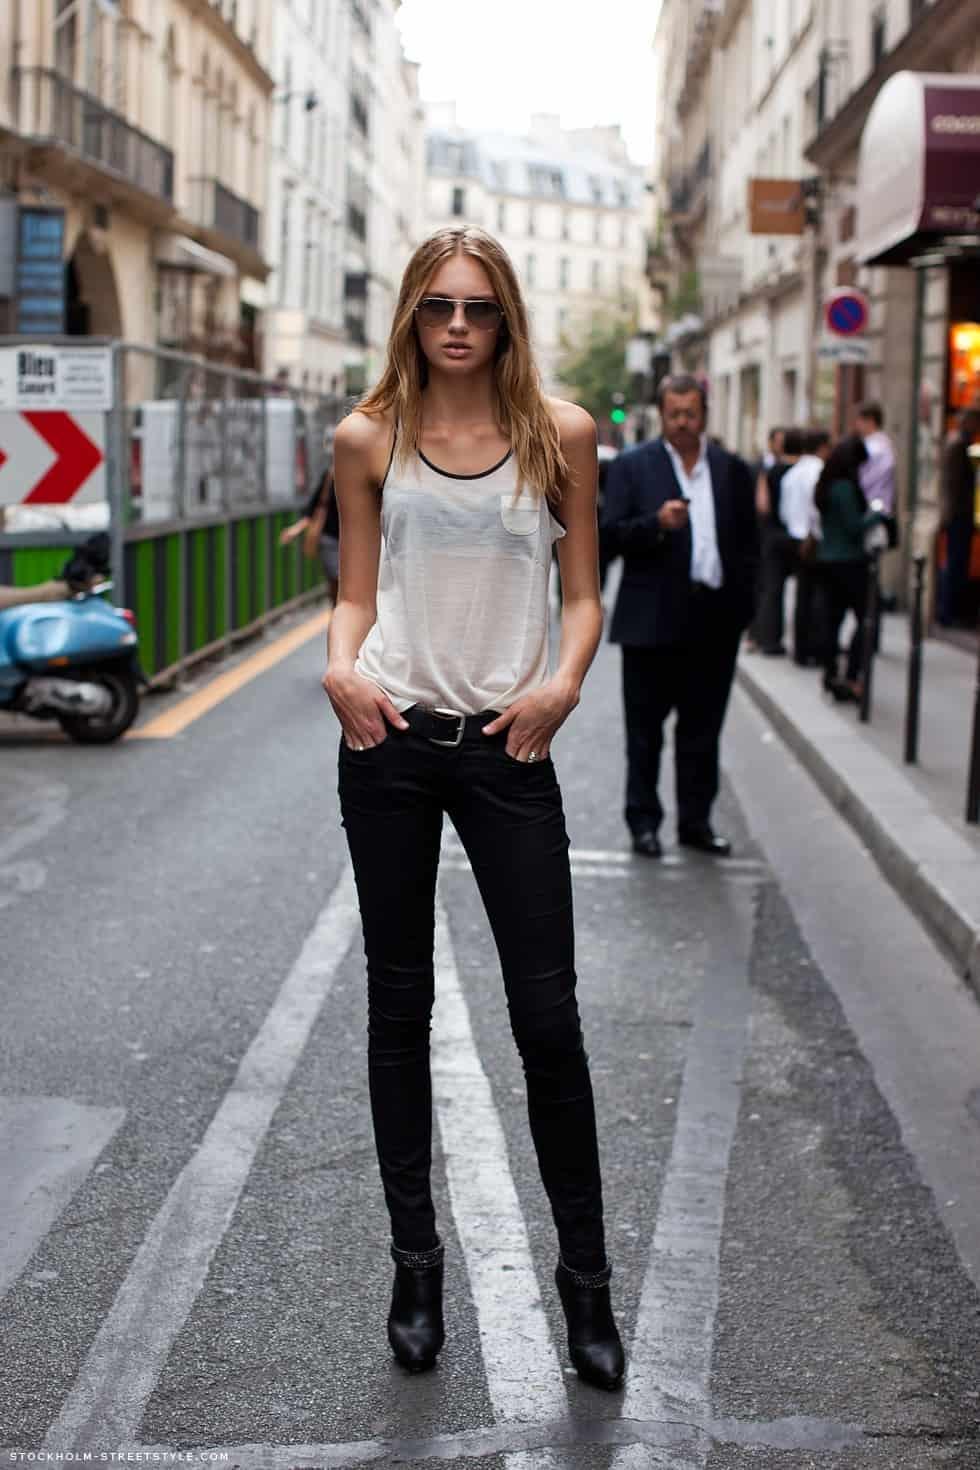 skinny-jeans-street-style-1